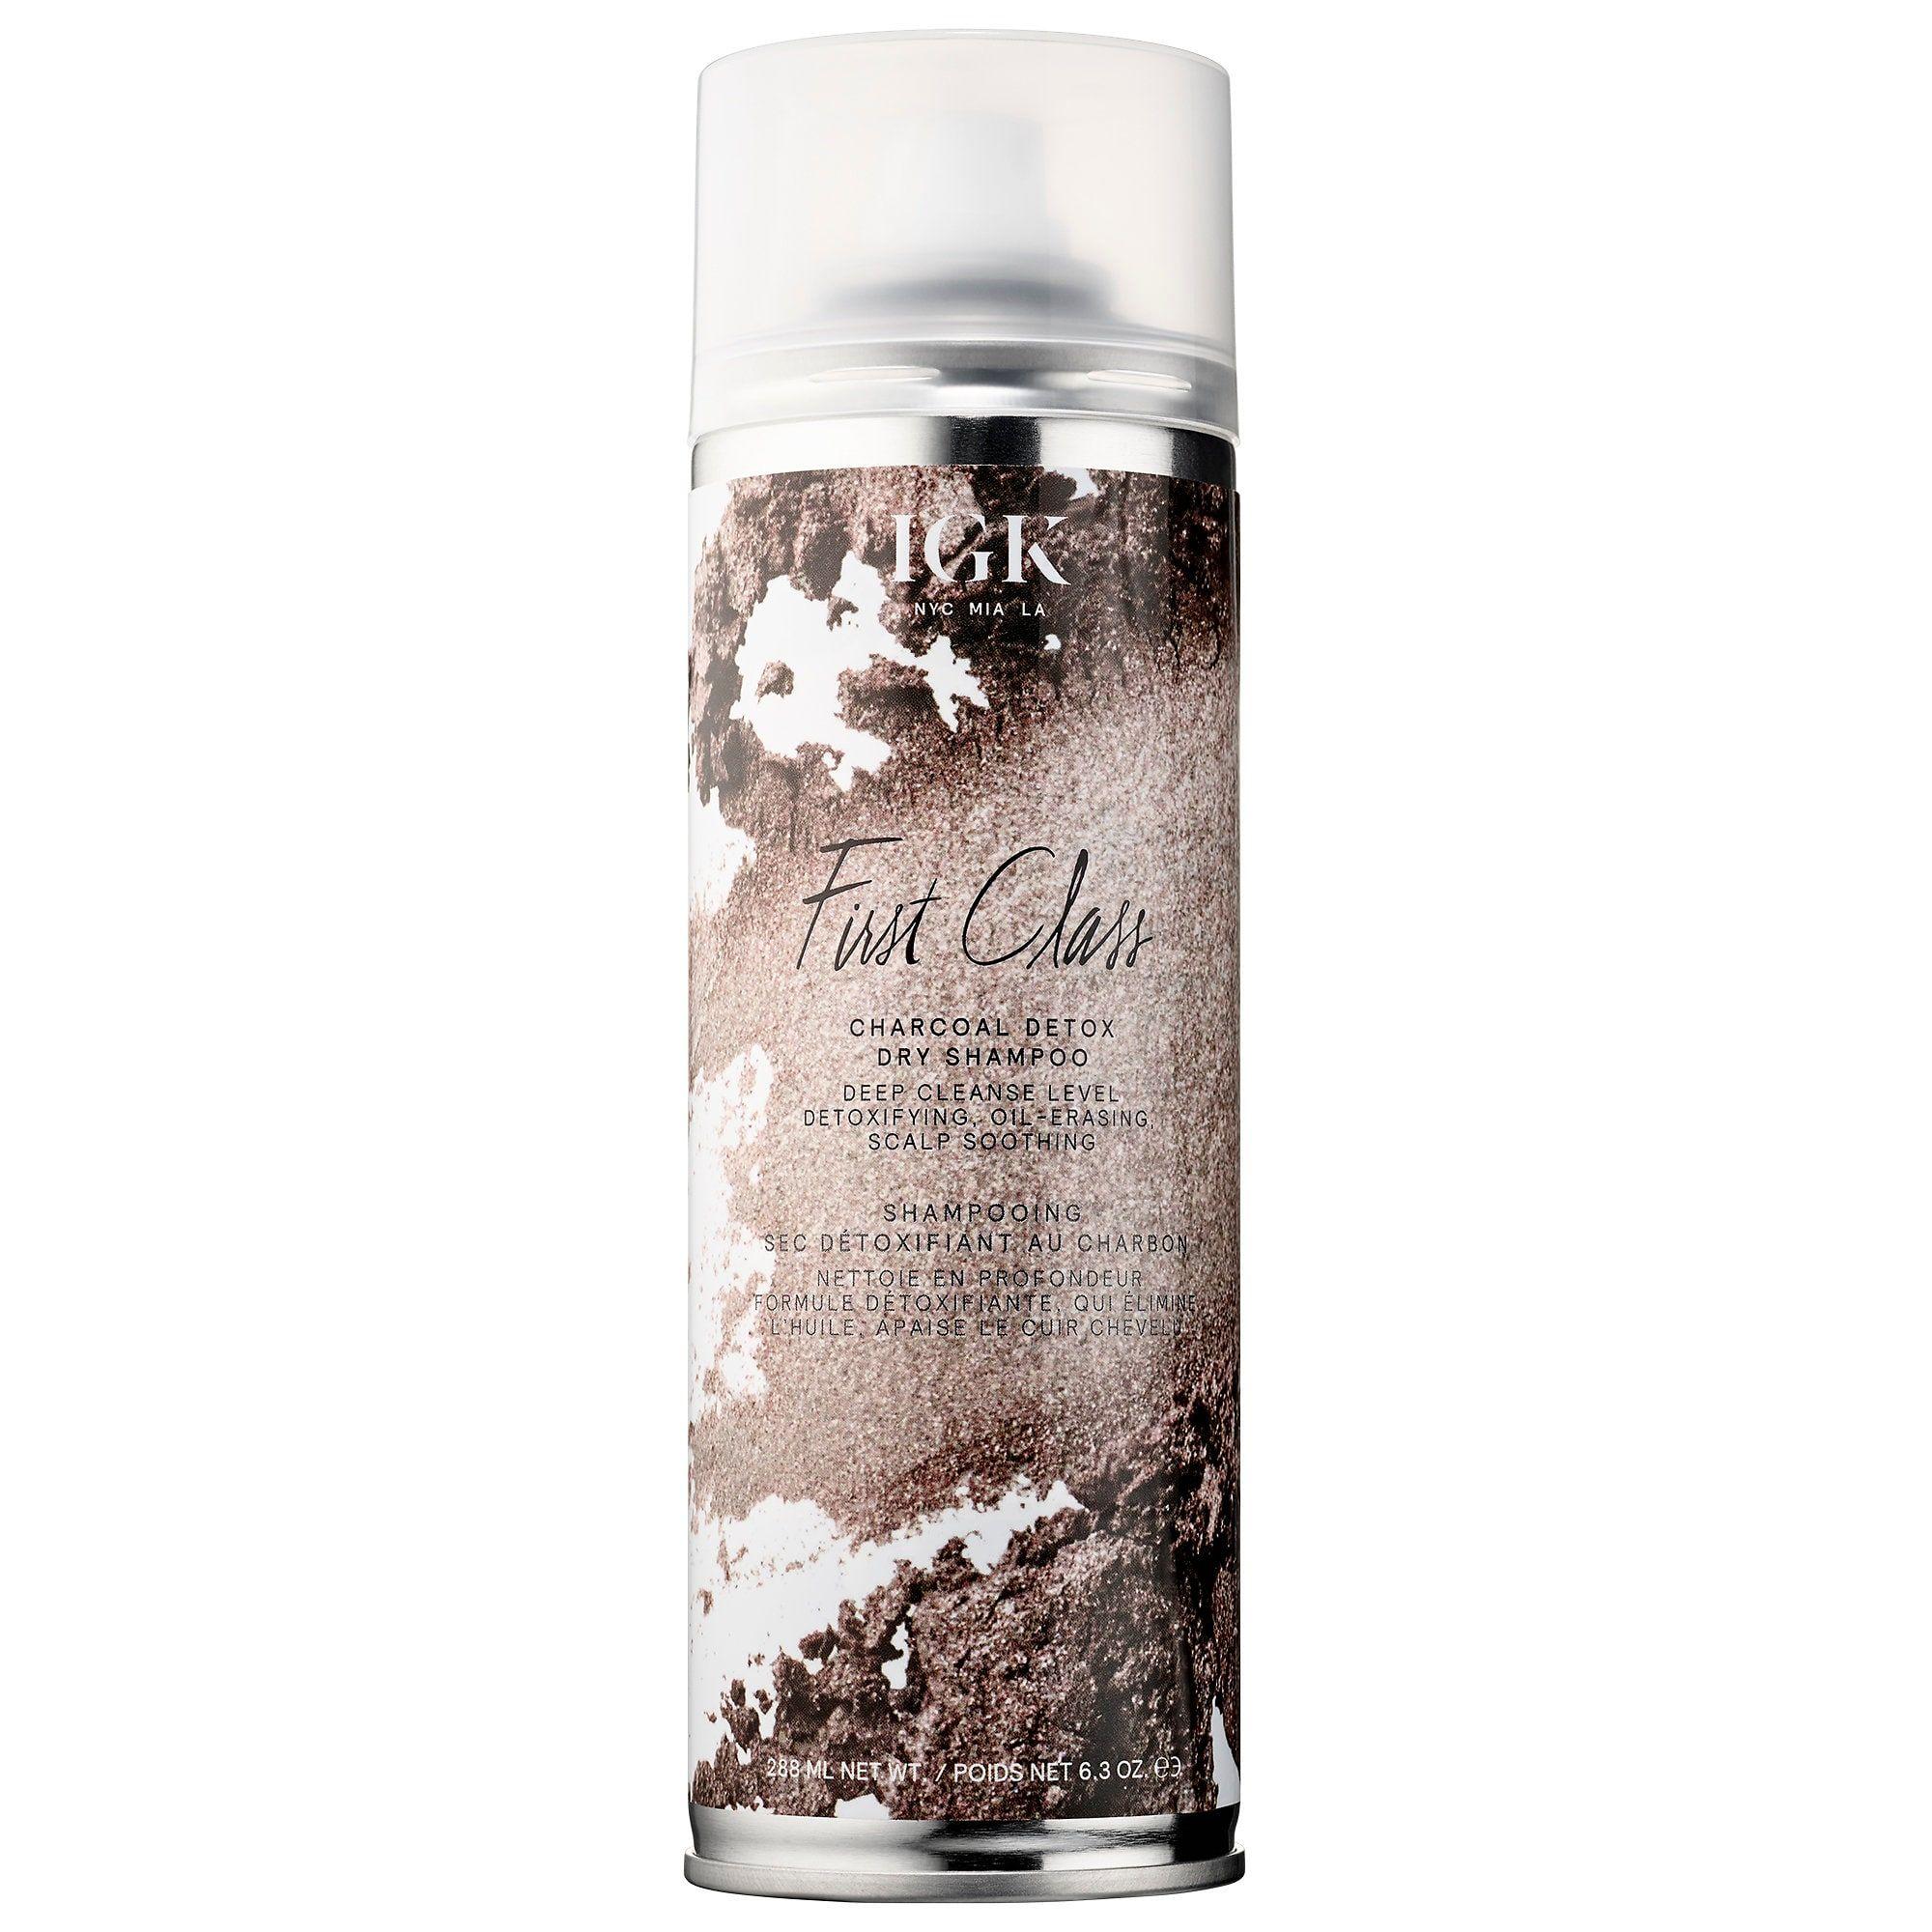 First Class Charcoal Detox Dry Shampoo Igk Sephora Dry Shampoo Charcoal Detox Good Dry Shampoo